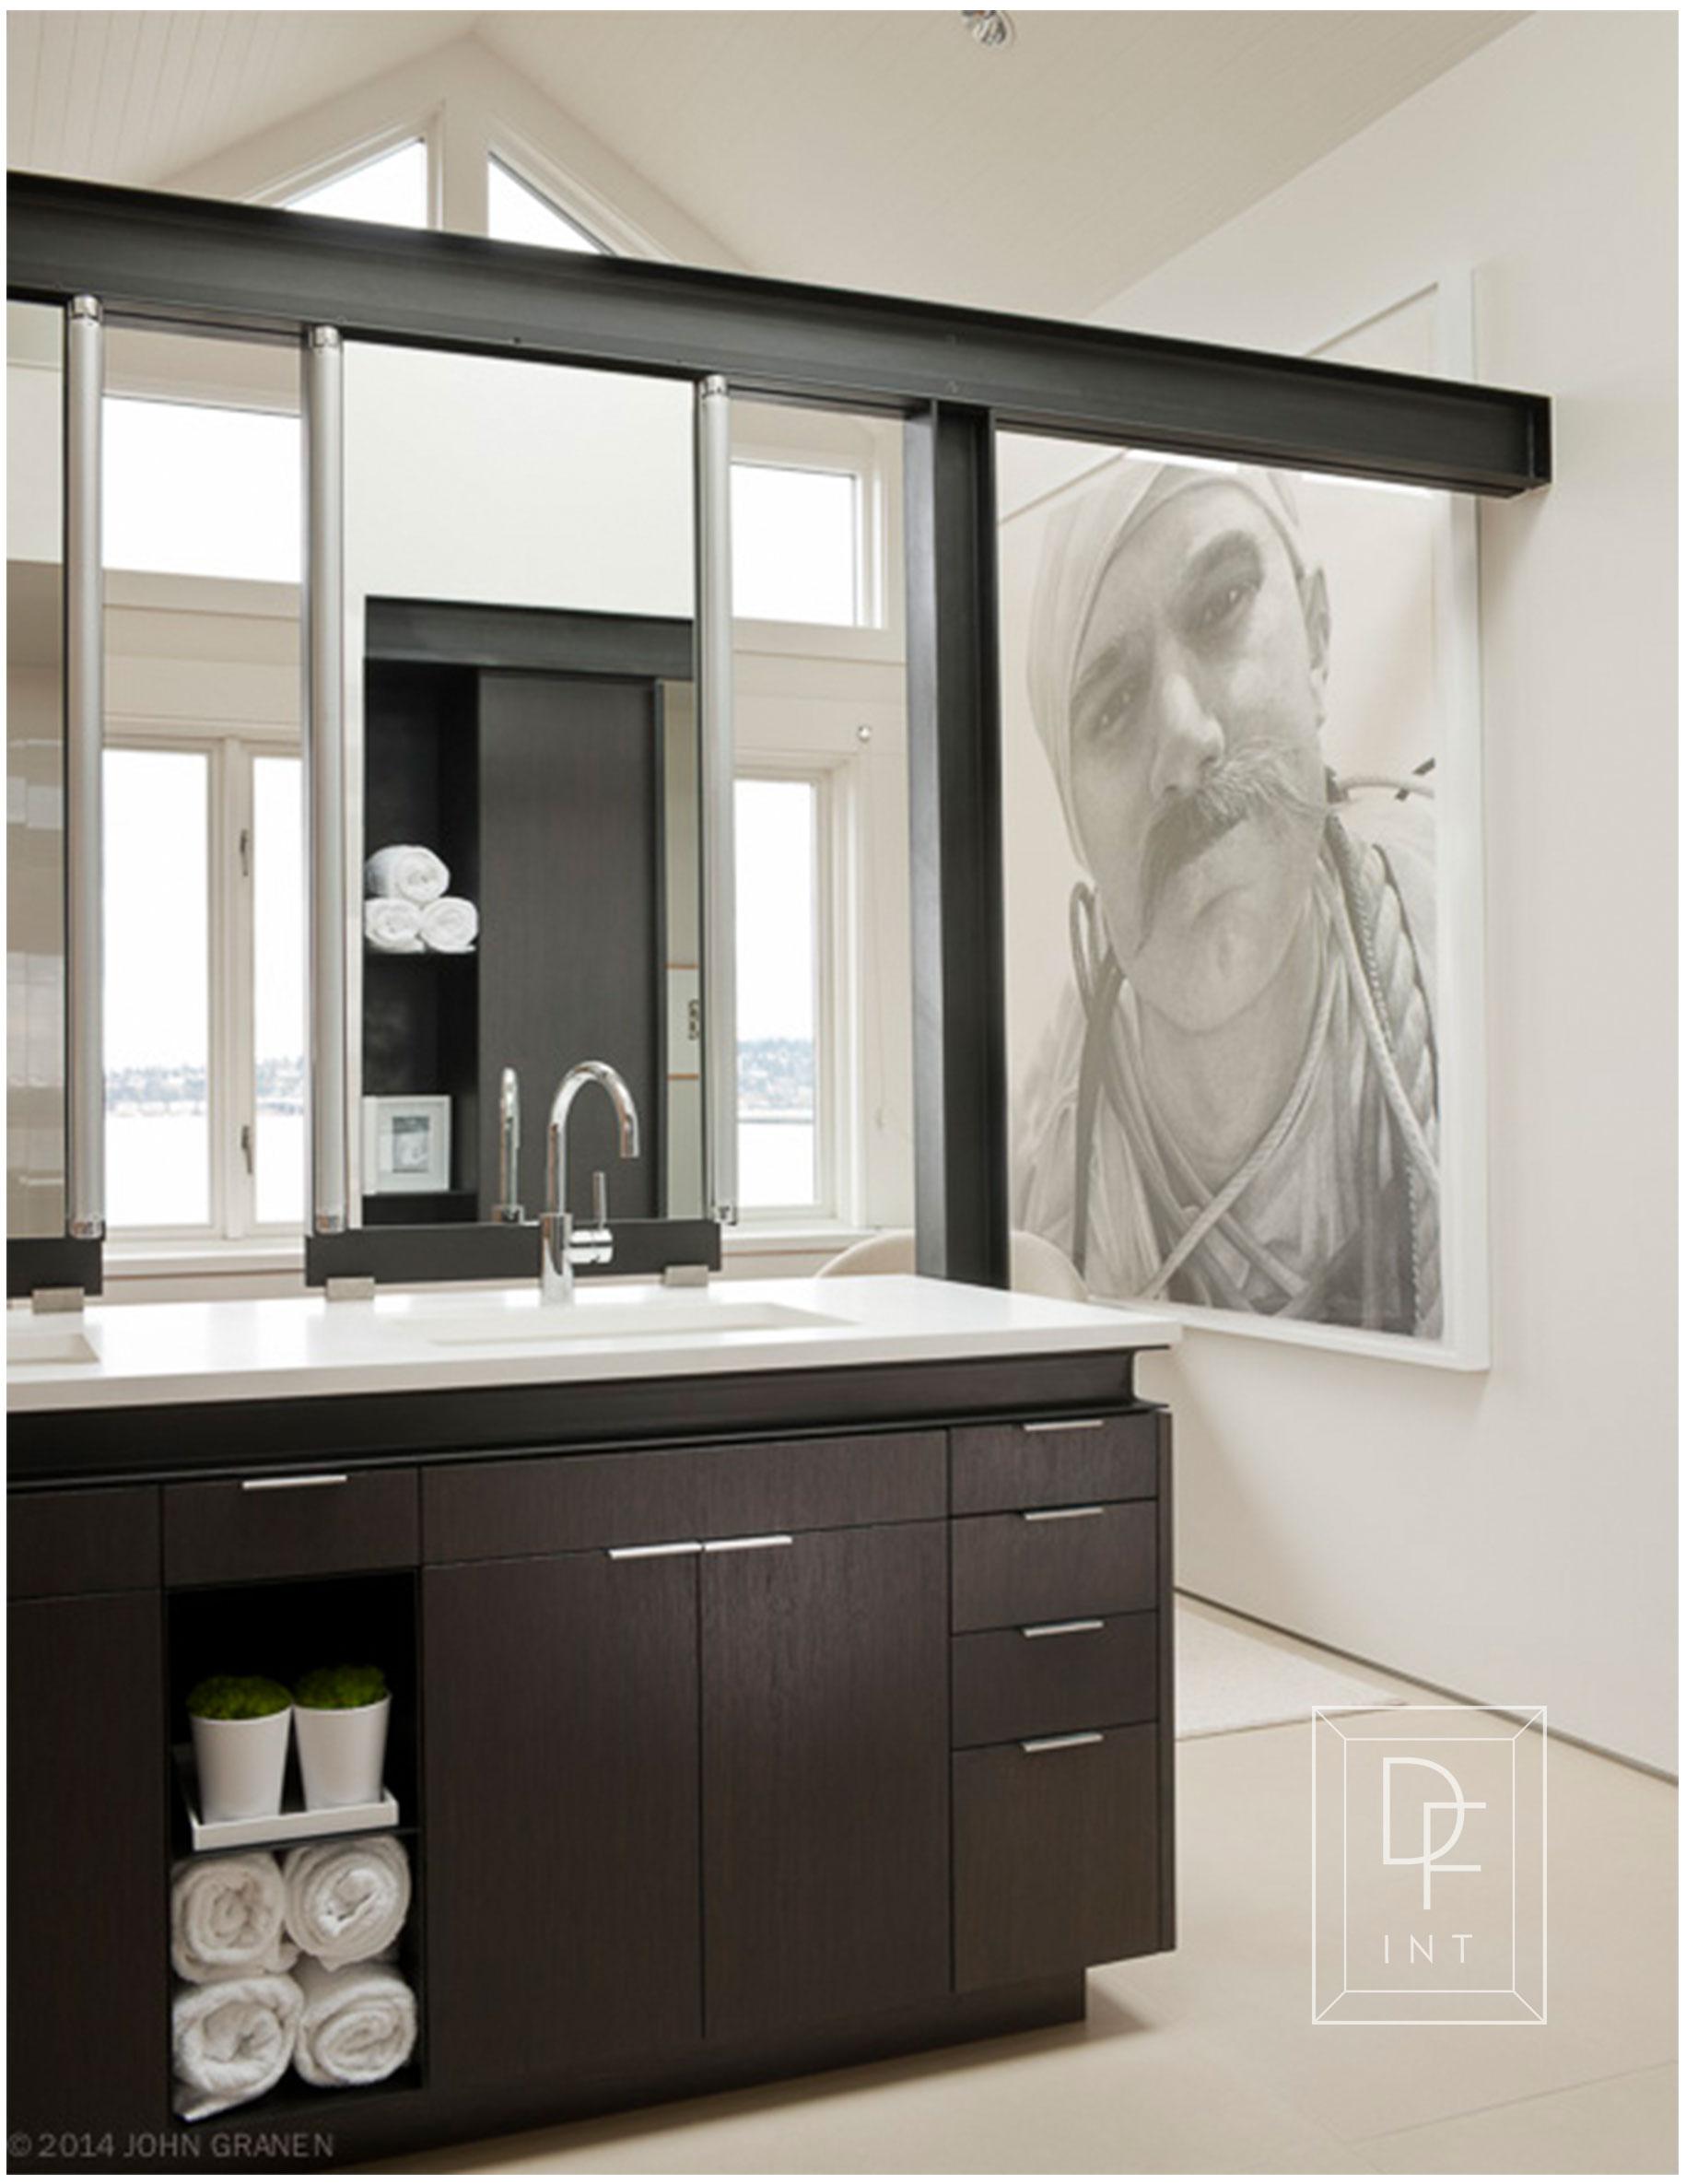 BathroomPicture_3.jpg